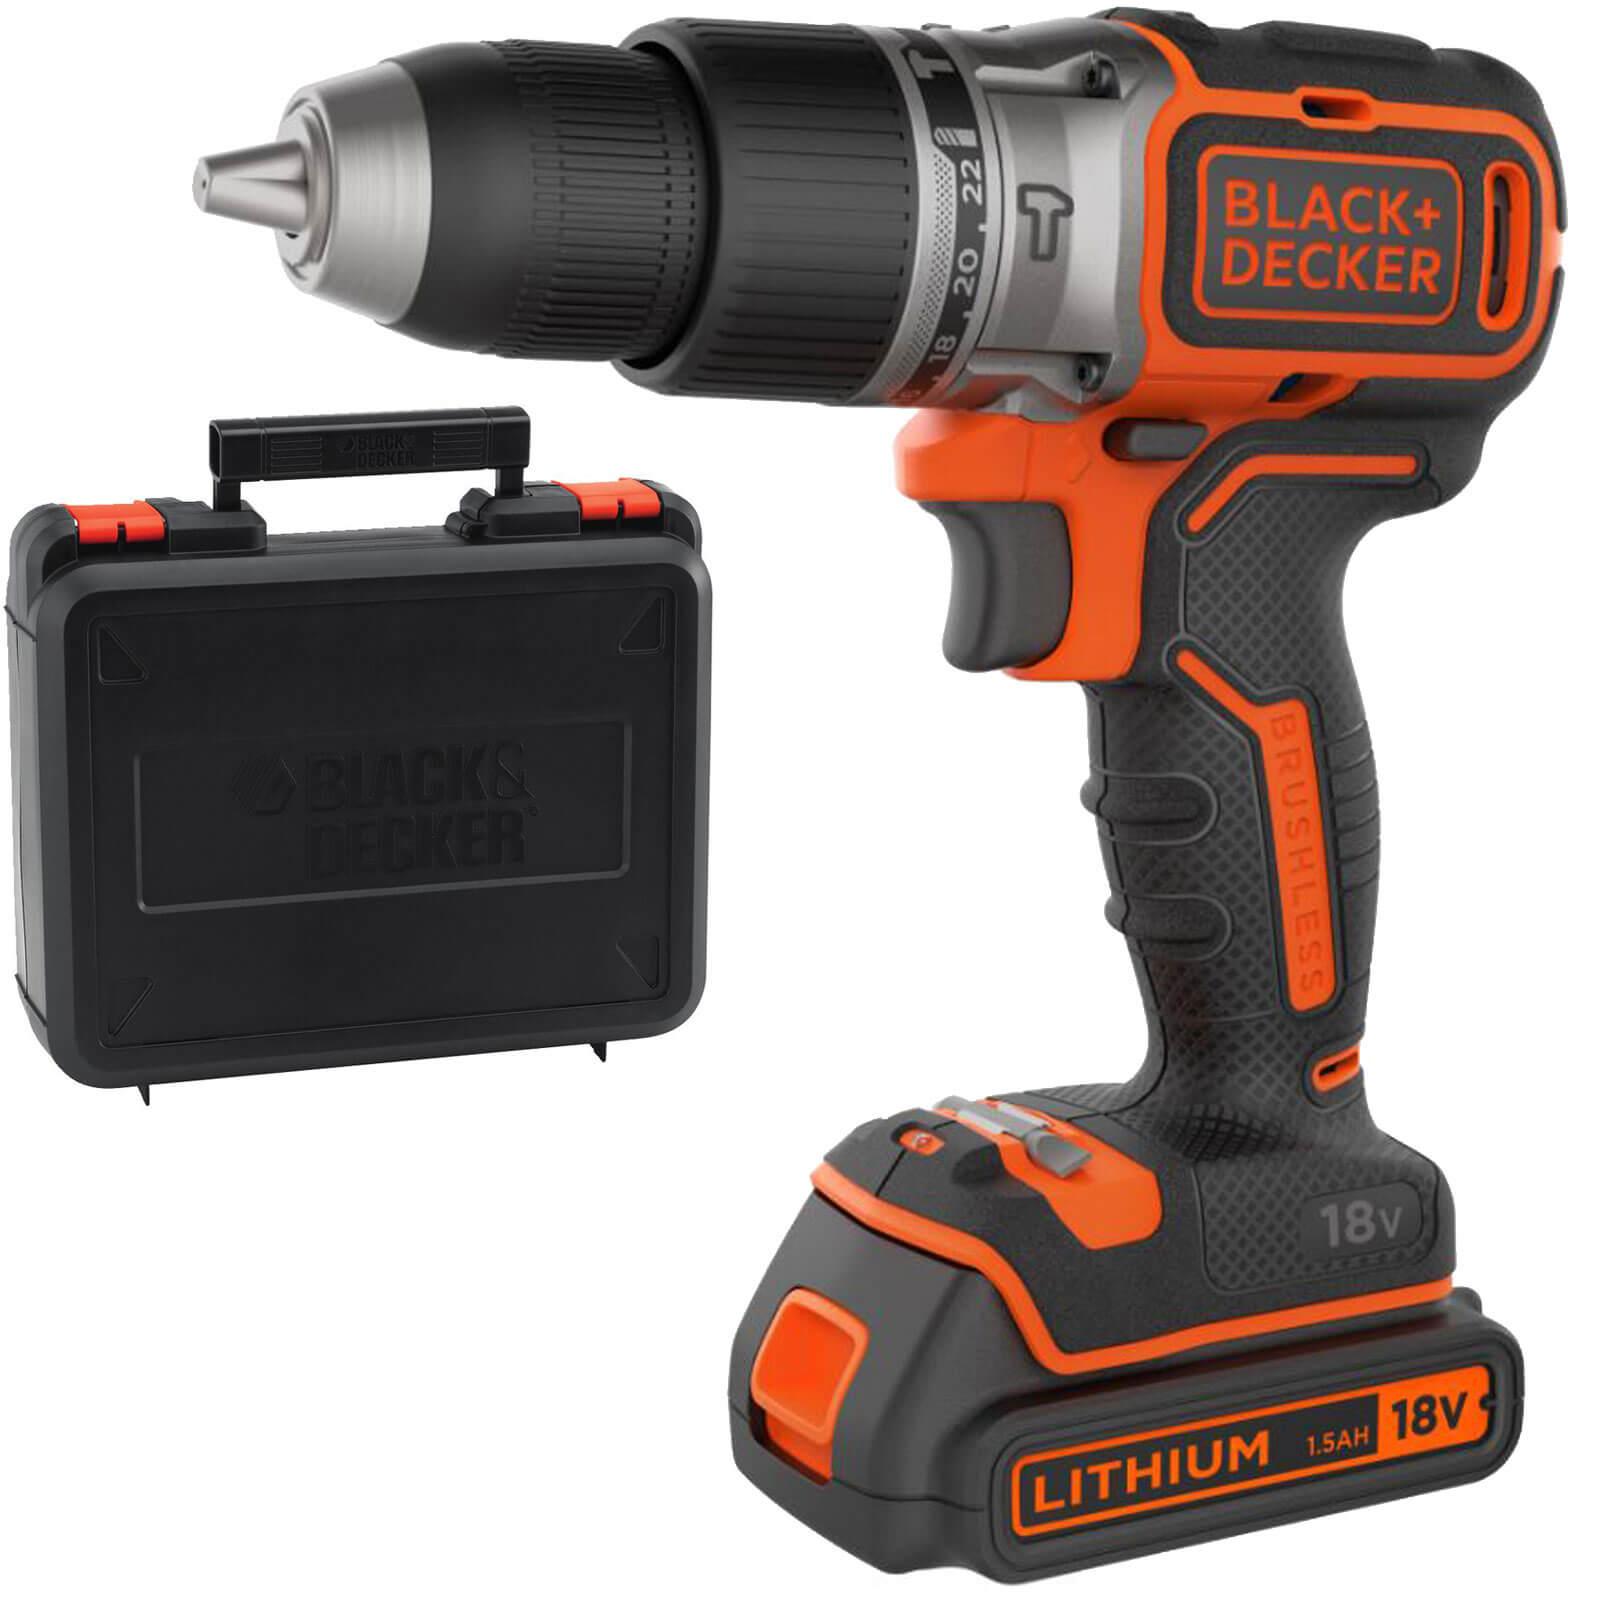 Black & Decker BL188 18v Cordless Combi Drill 1 x 1.5ah Liion Charger Case